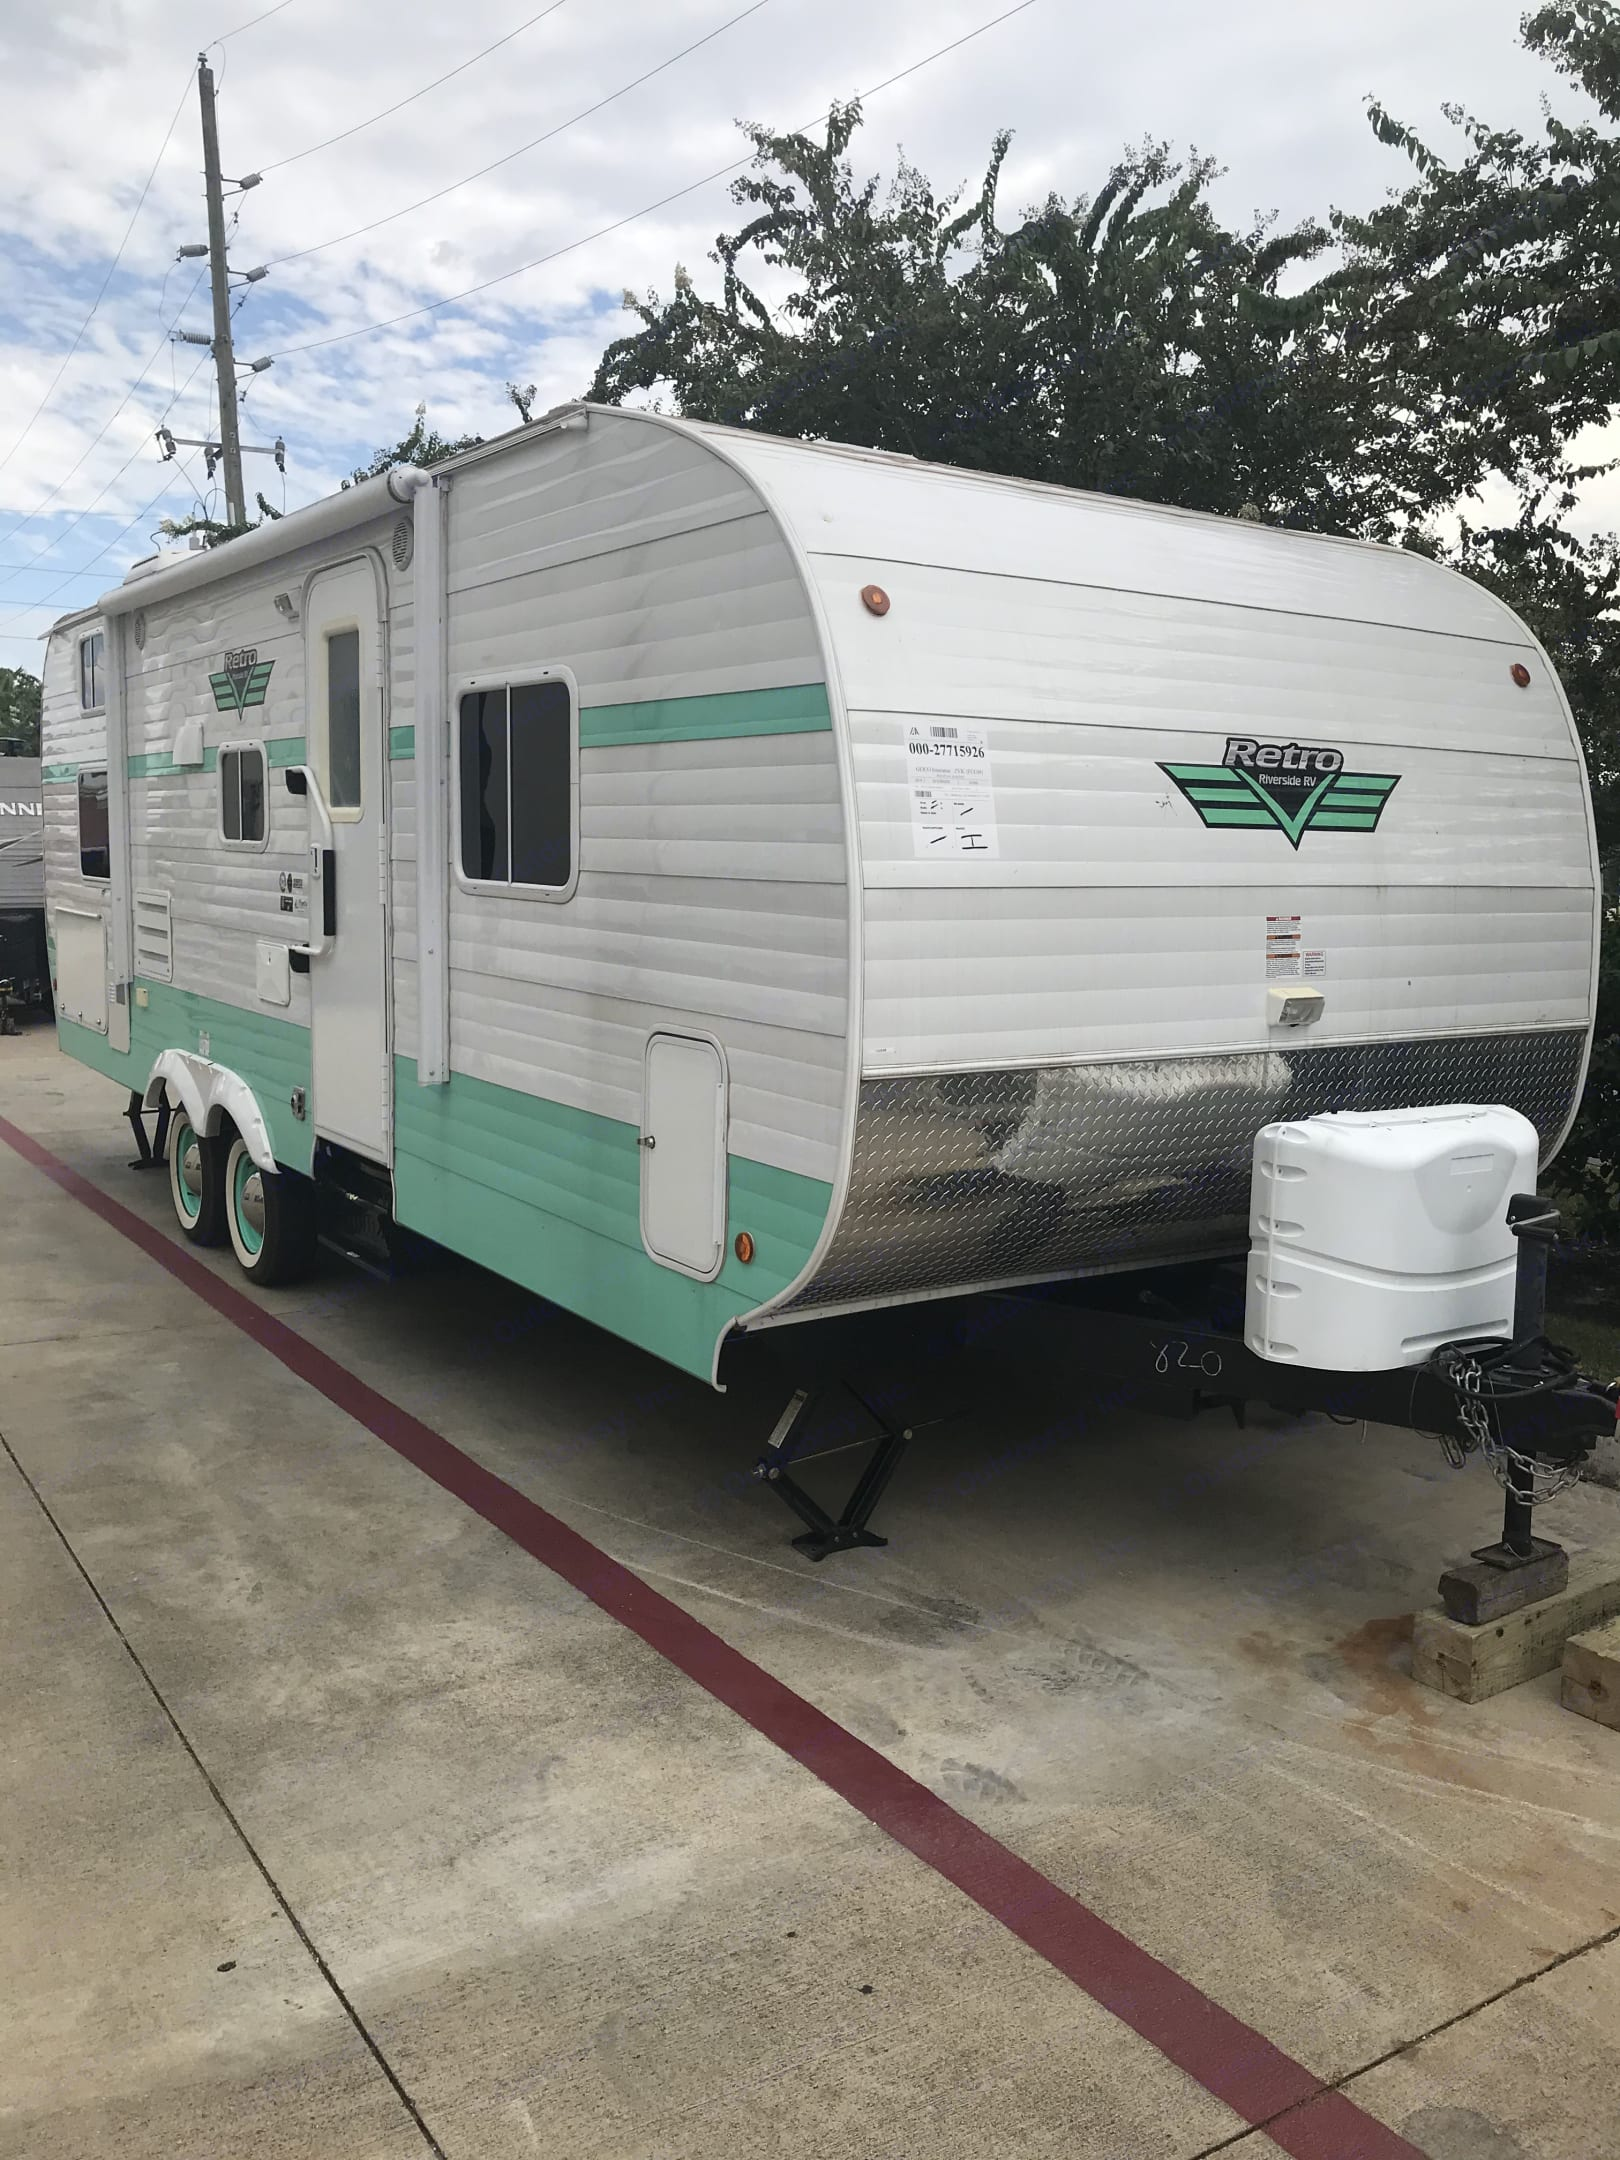 Frt and side. Riverside Retro 265RB 2019